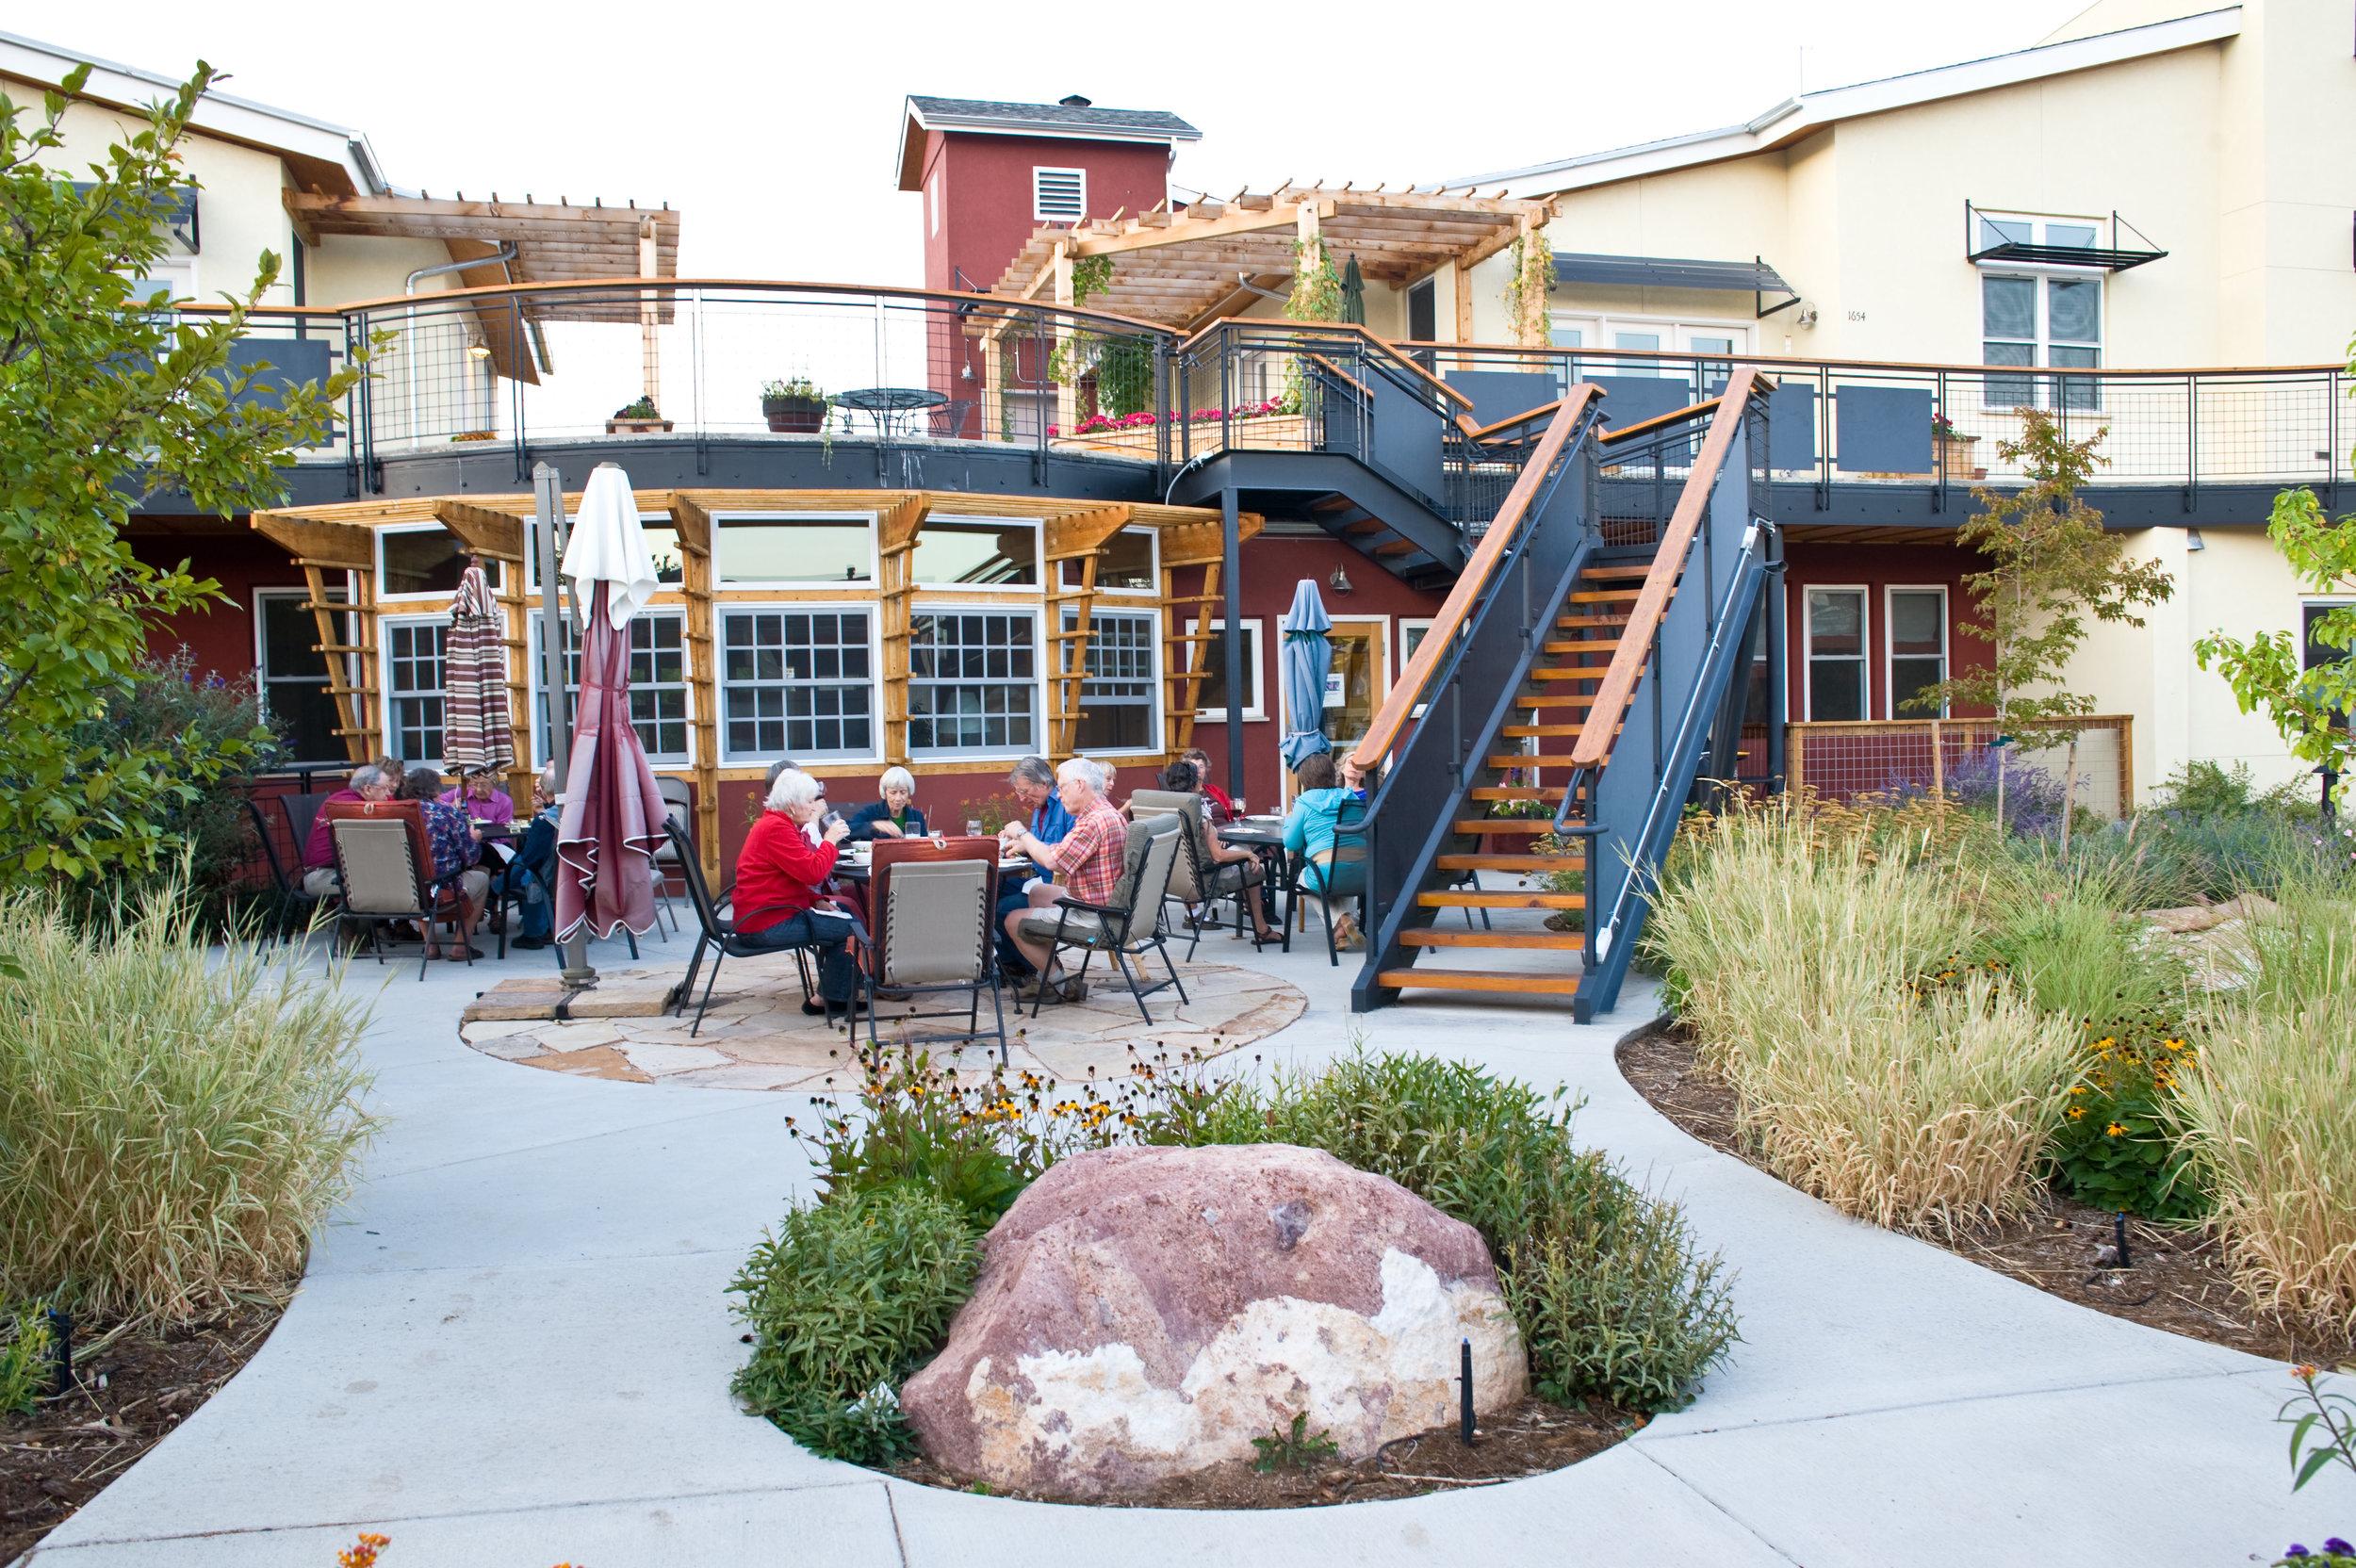 Silver Sage Cohousing, Boulder, CO. Architecture by McCamant & Durrett Architects